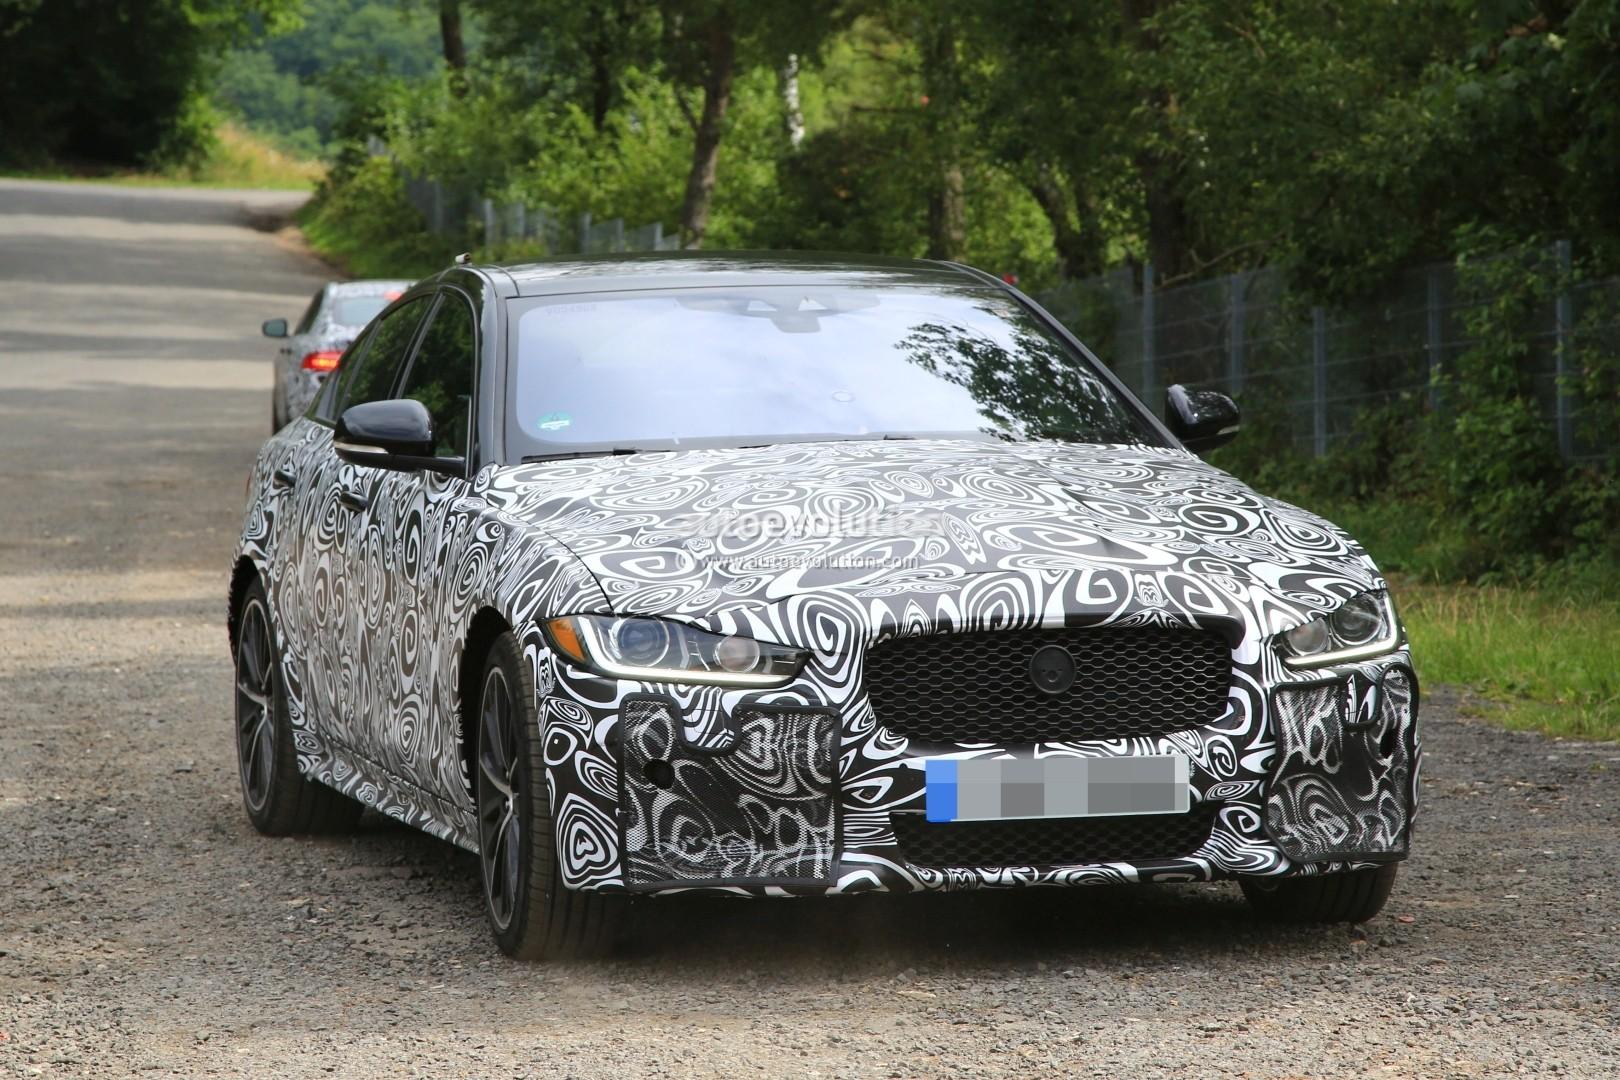 2018 jaguar xe svr. Interesting 2018 Jaguar XE SVR Spied  Intended 2018 Jaguar Xe Svr